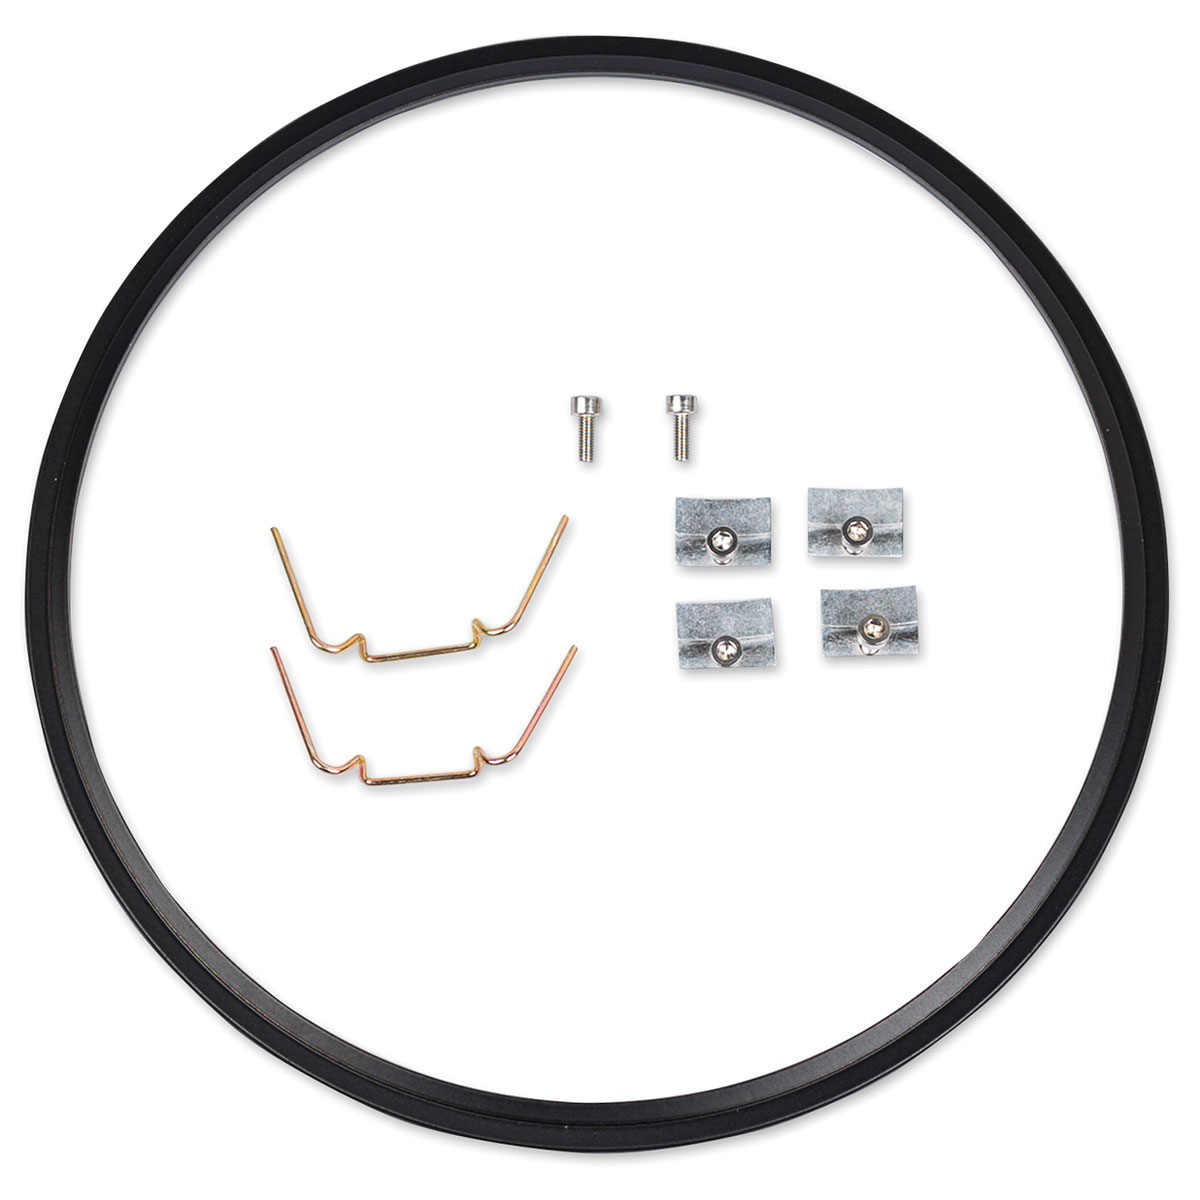 J.W. Speaker 7″ Black Headlight Adapter Kit